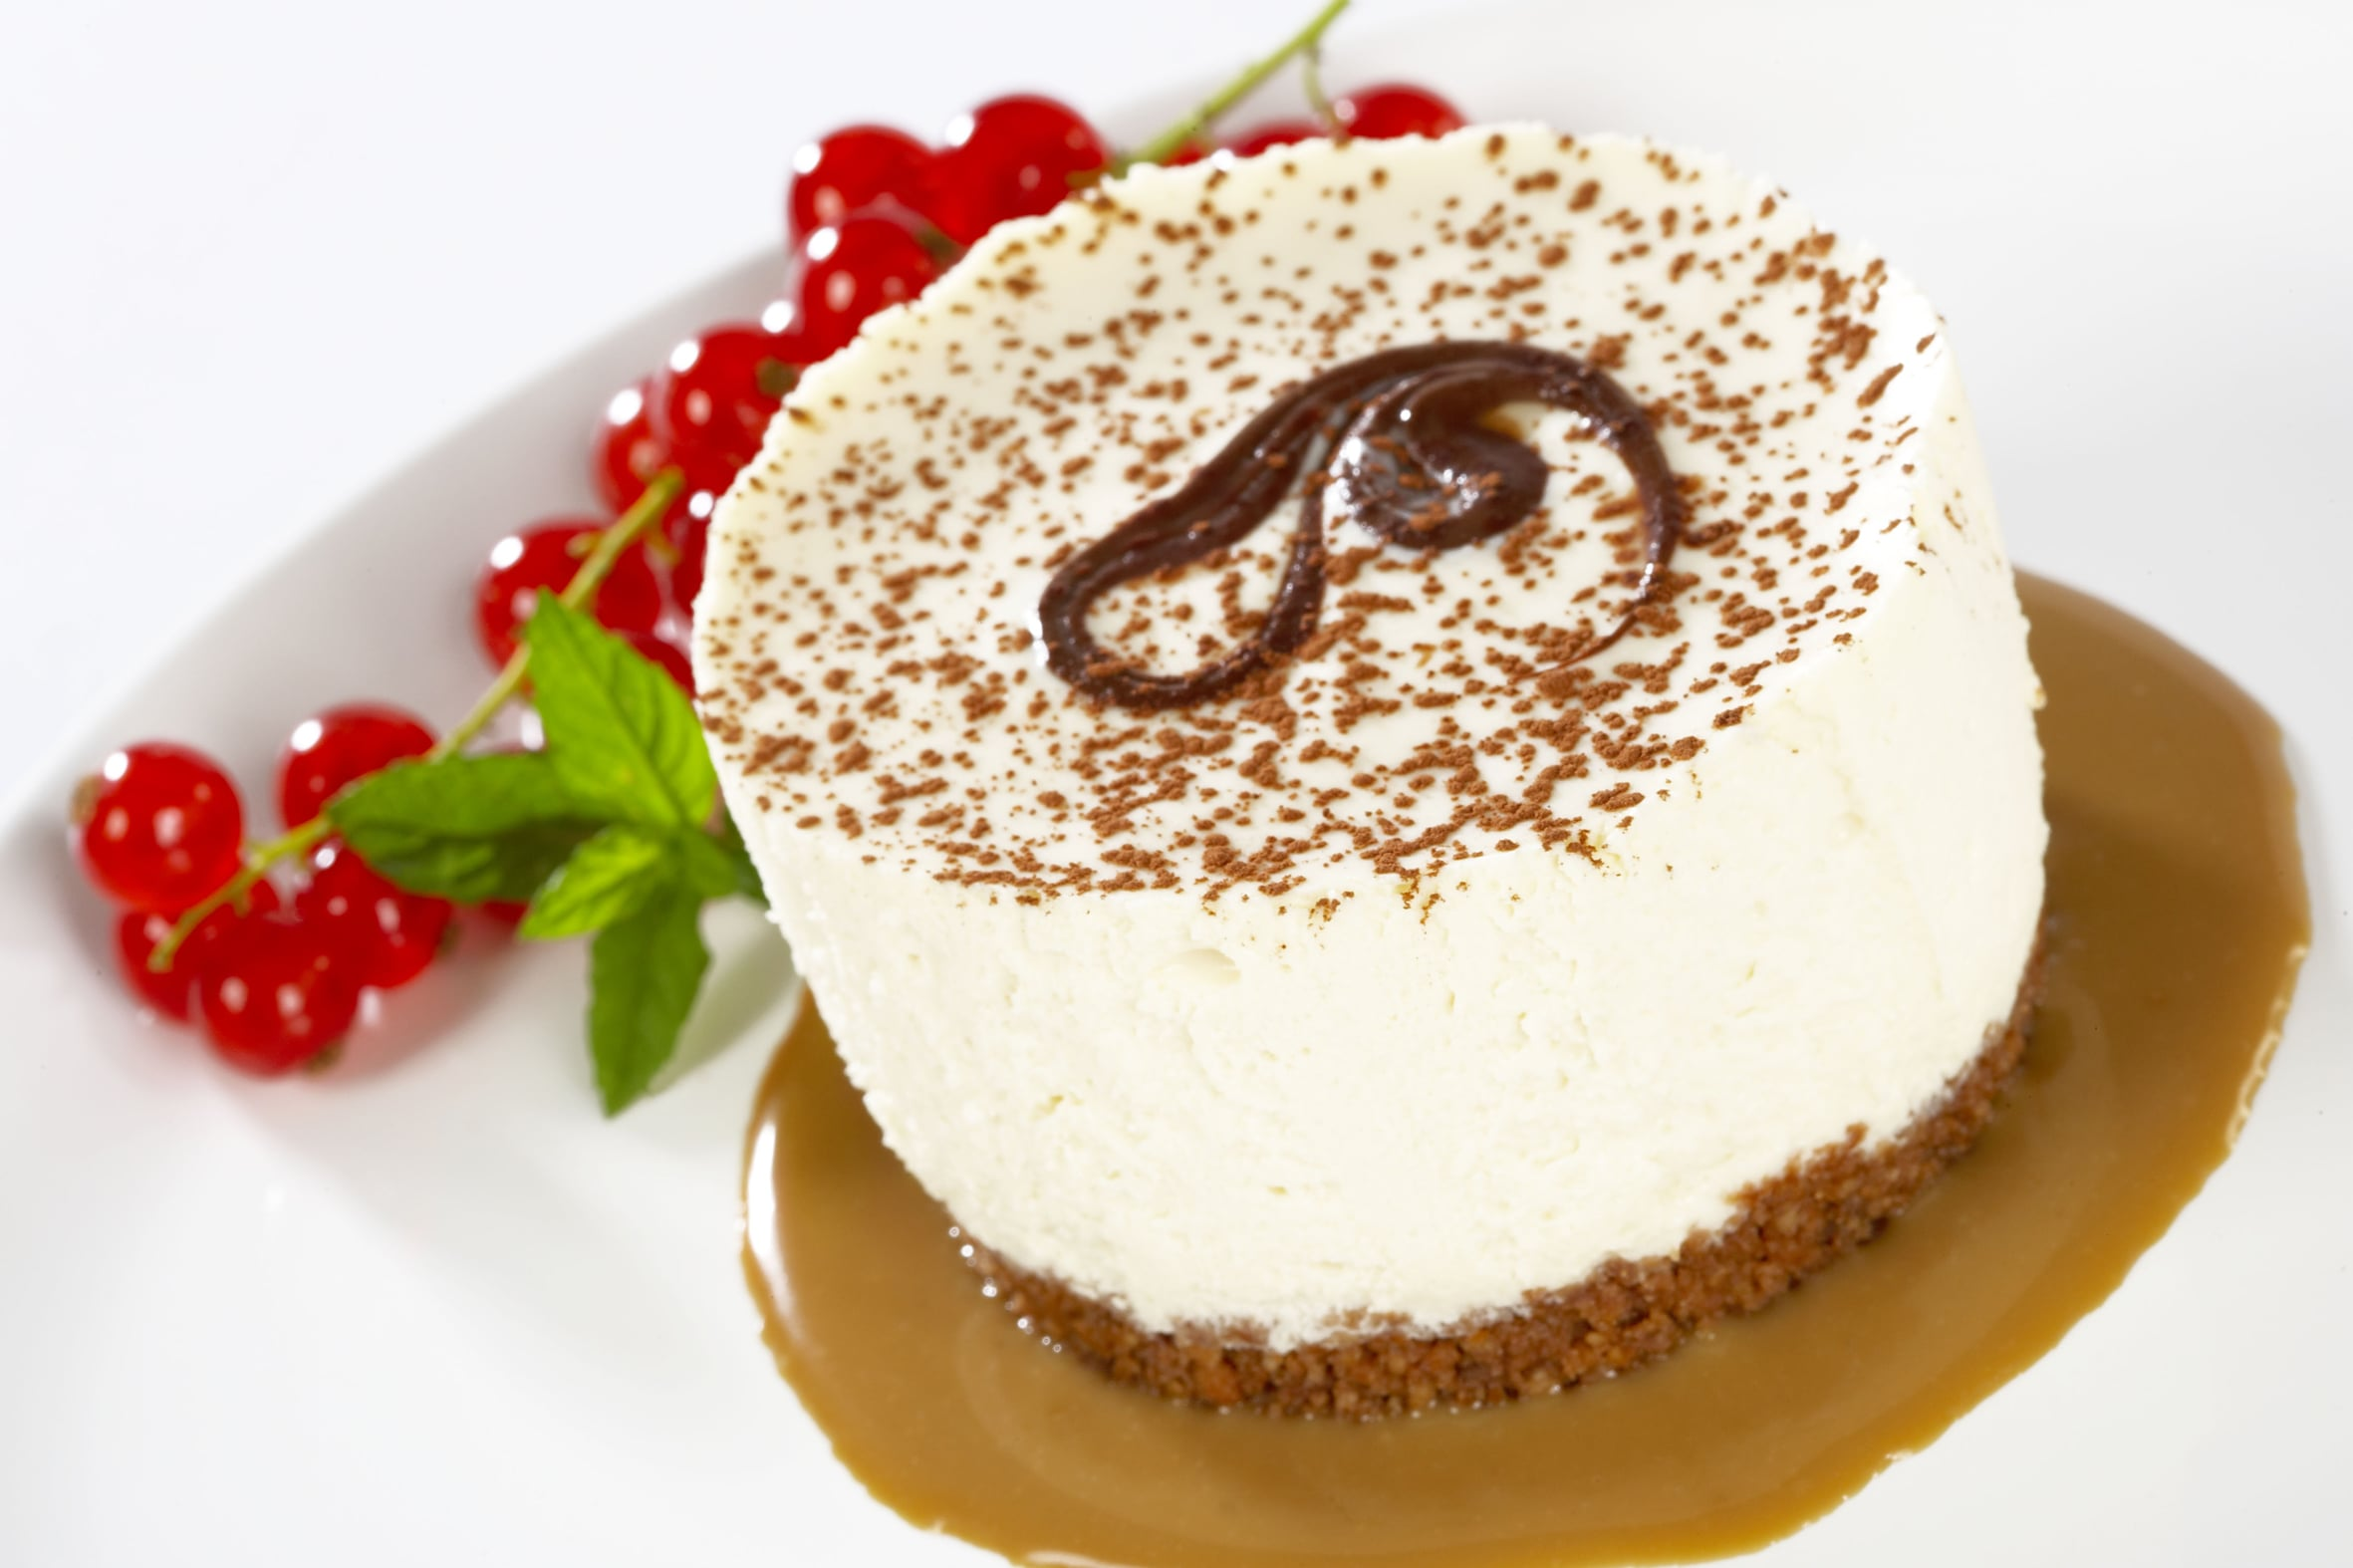 The Skinny Chef Desserts - Caramel Swirl